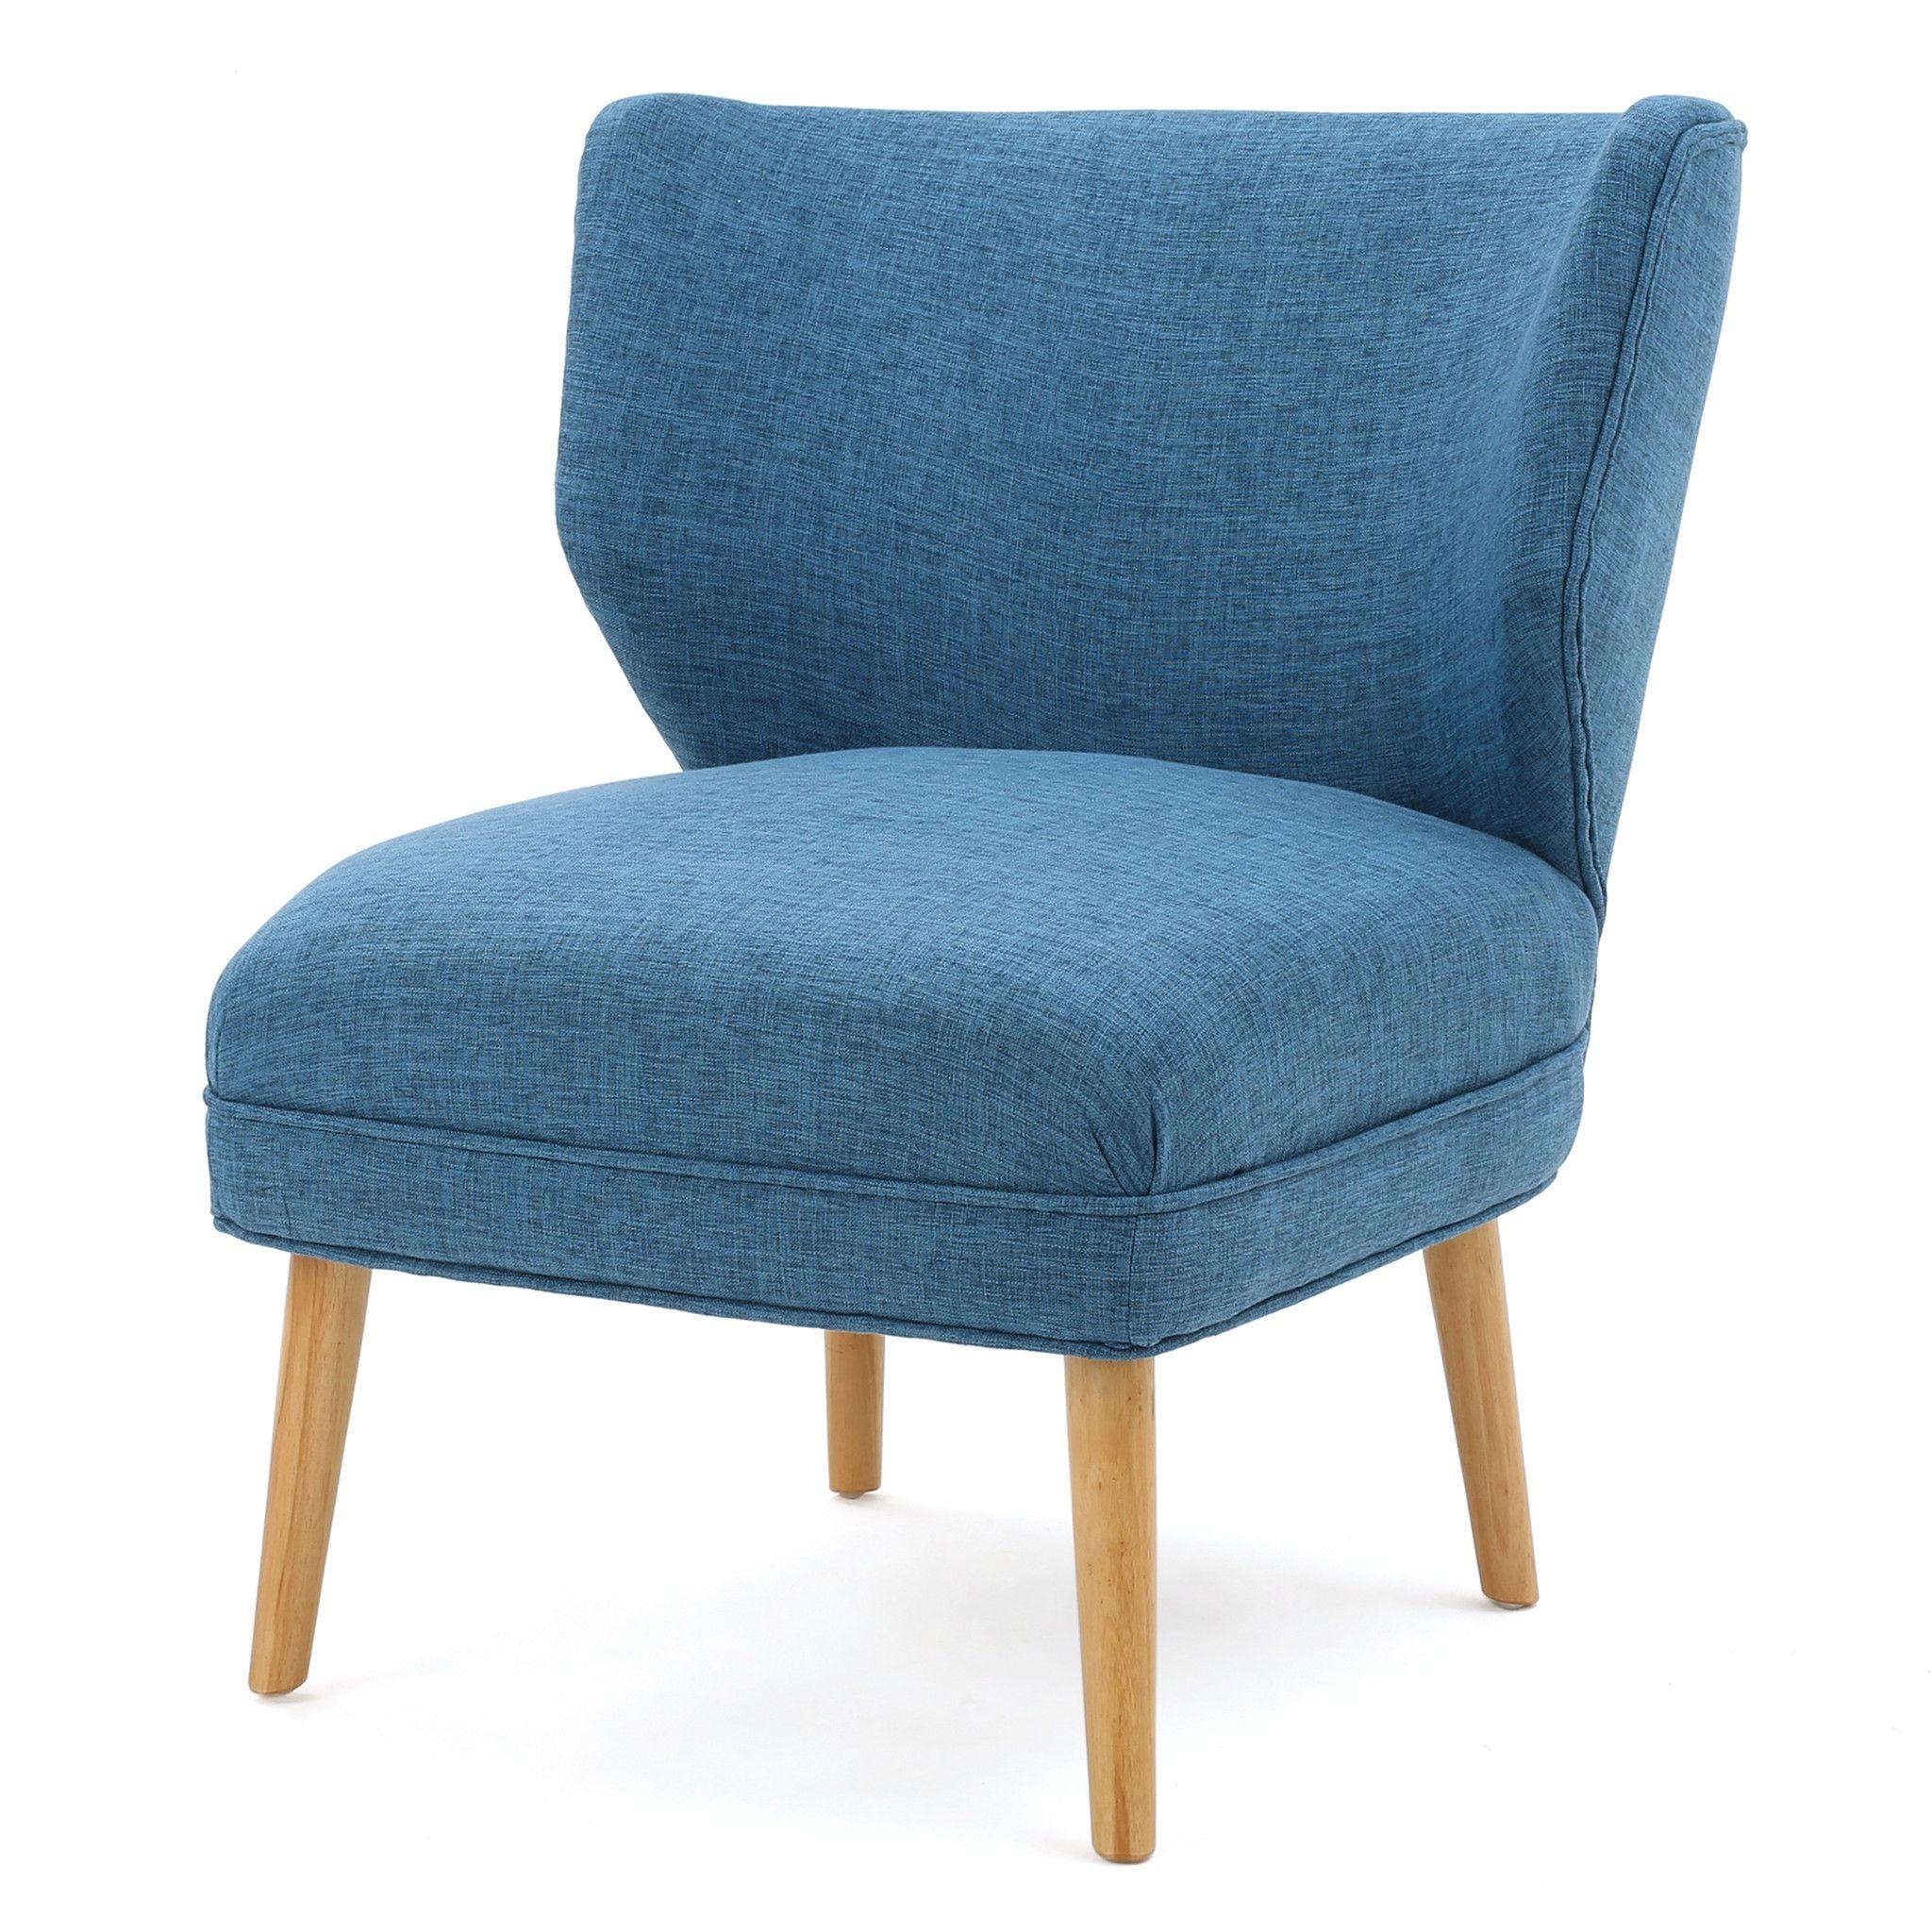 Best Divero Mid Century Fabric Accent Chair Blue Accent 640 x 480